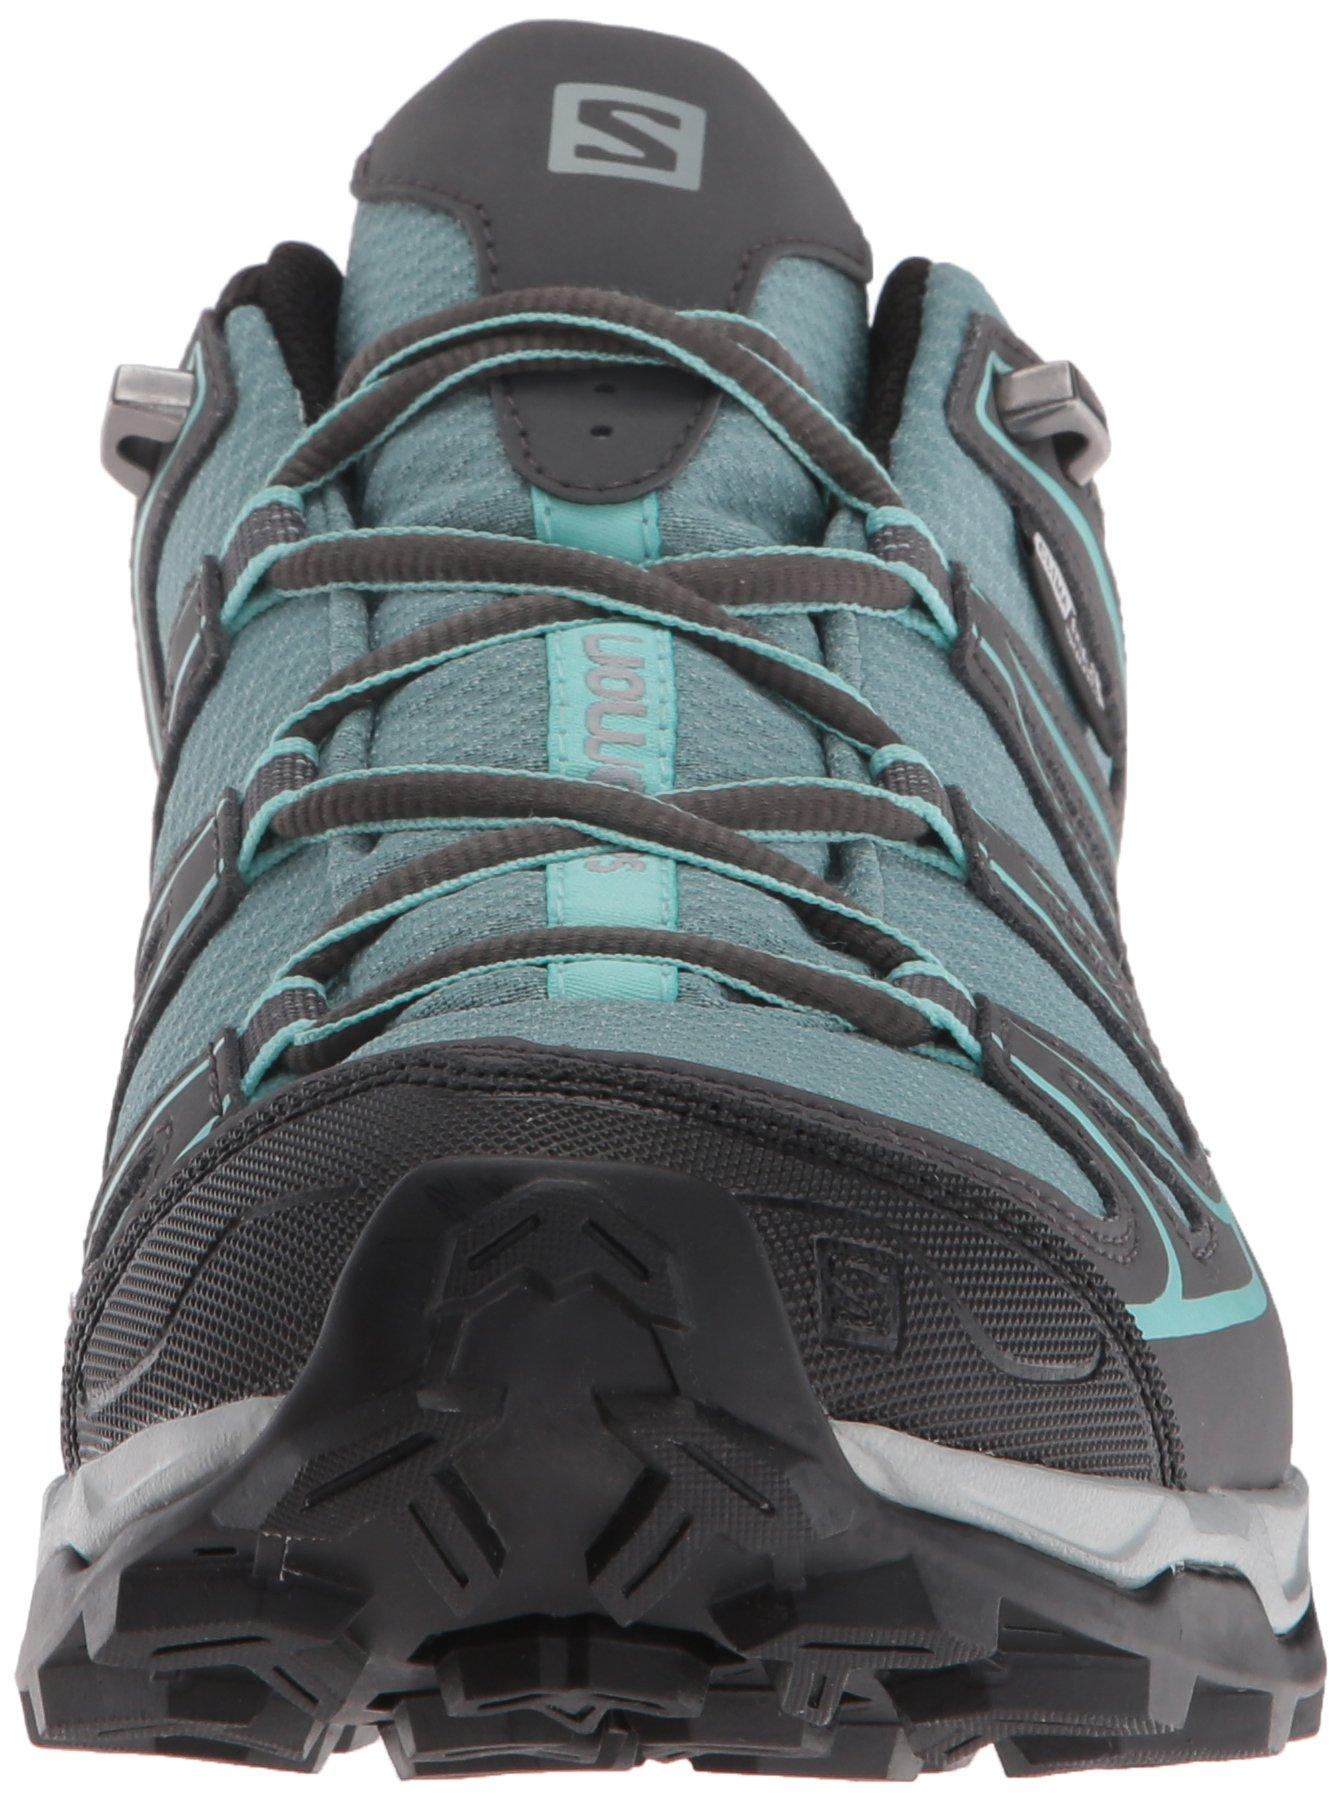 81ppVPOQOFL - SALOMON Women's Hiking Shoe